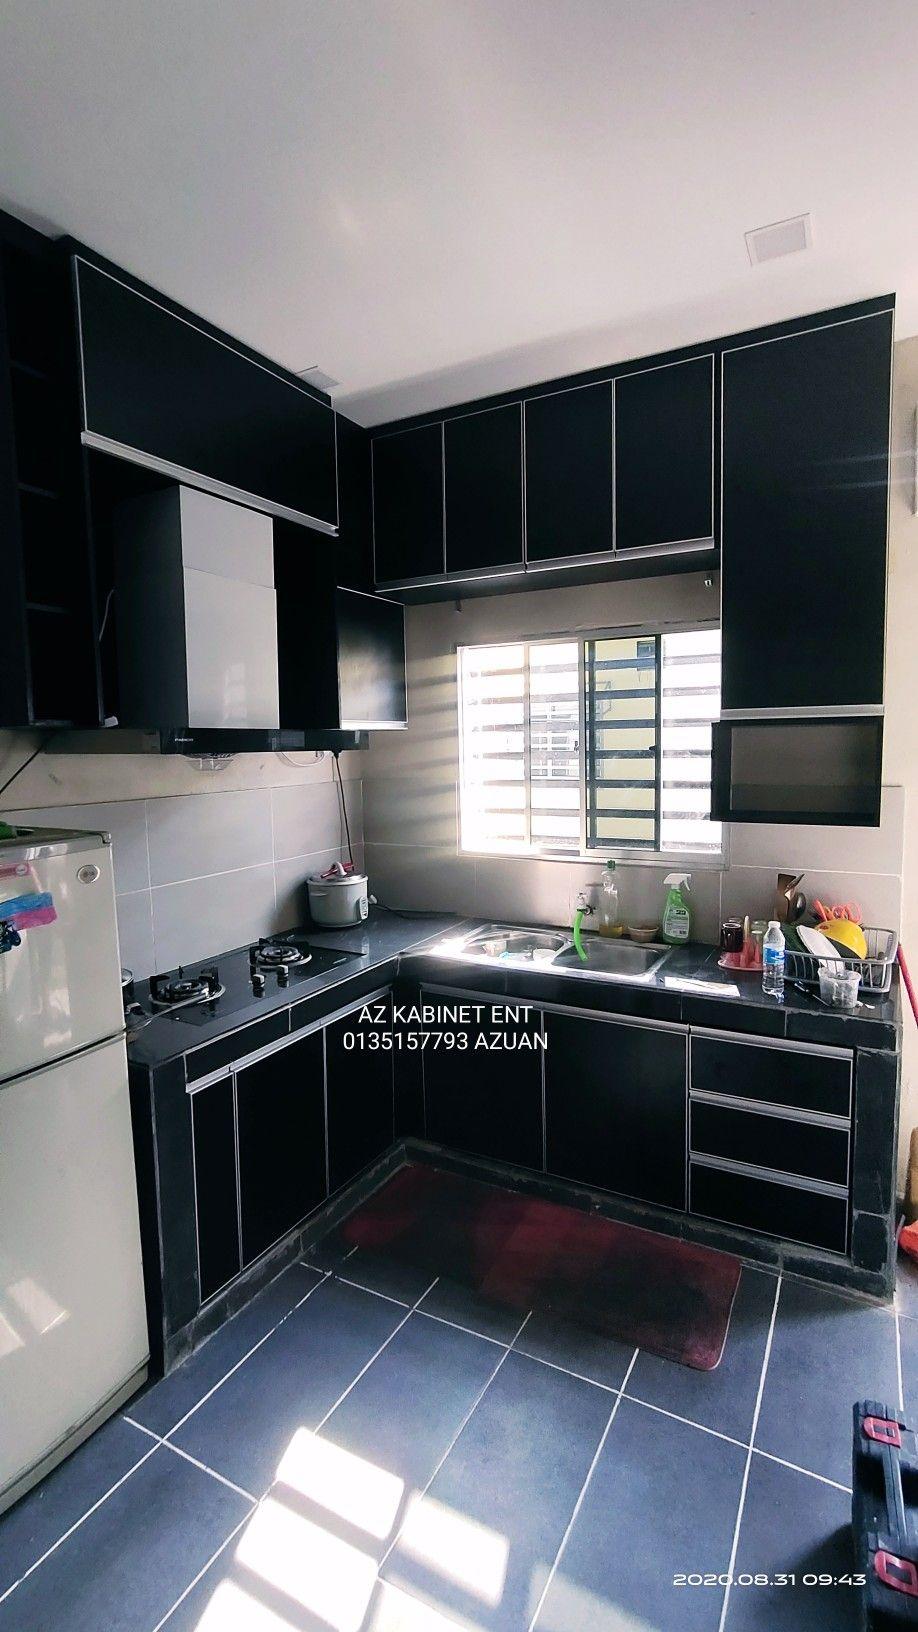 Az Kabinet Ent Kitchen Cabinets Home Decor Kitchen